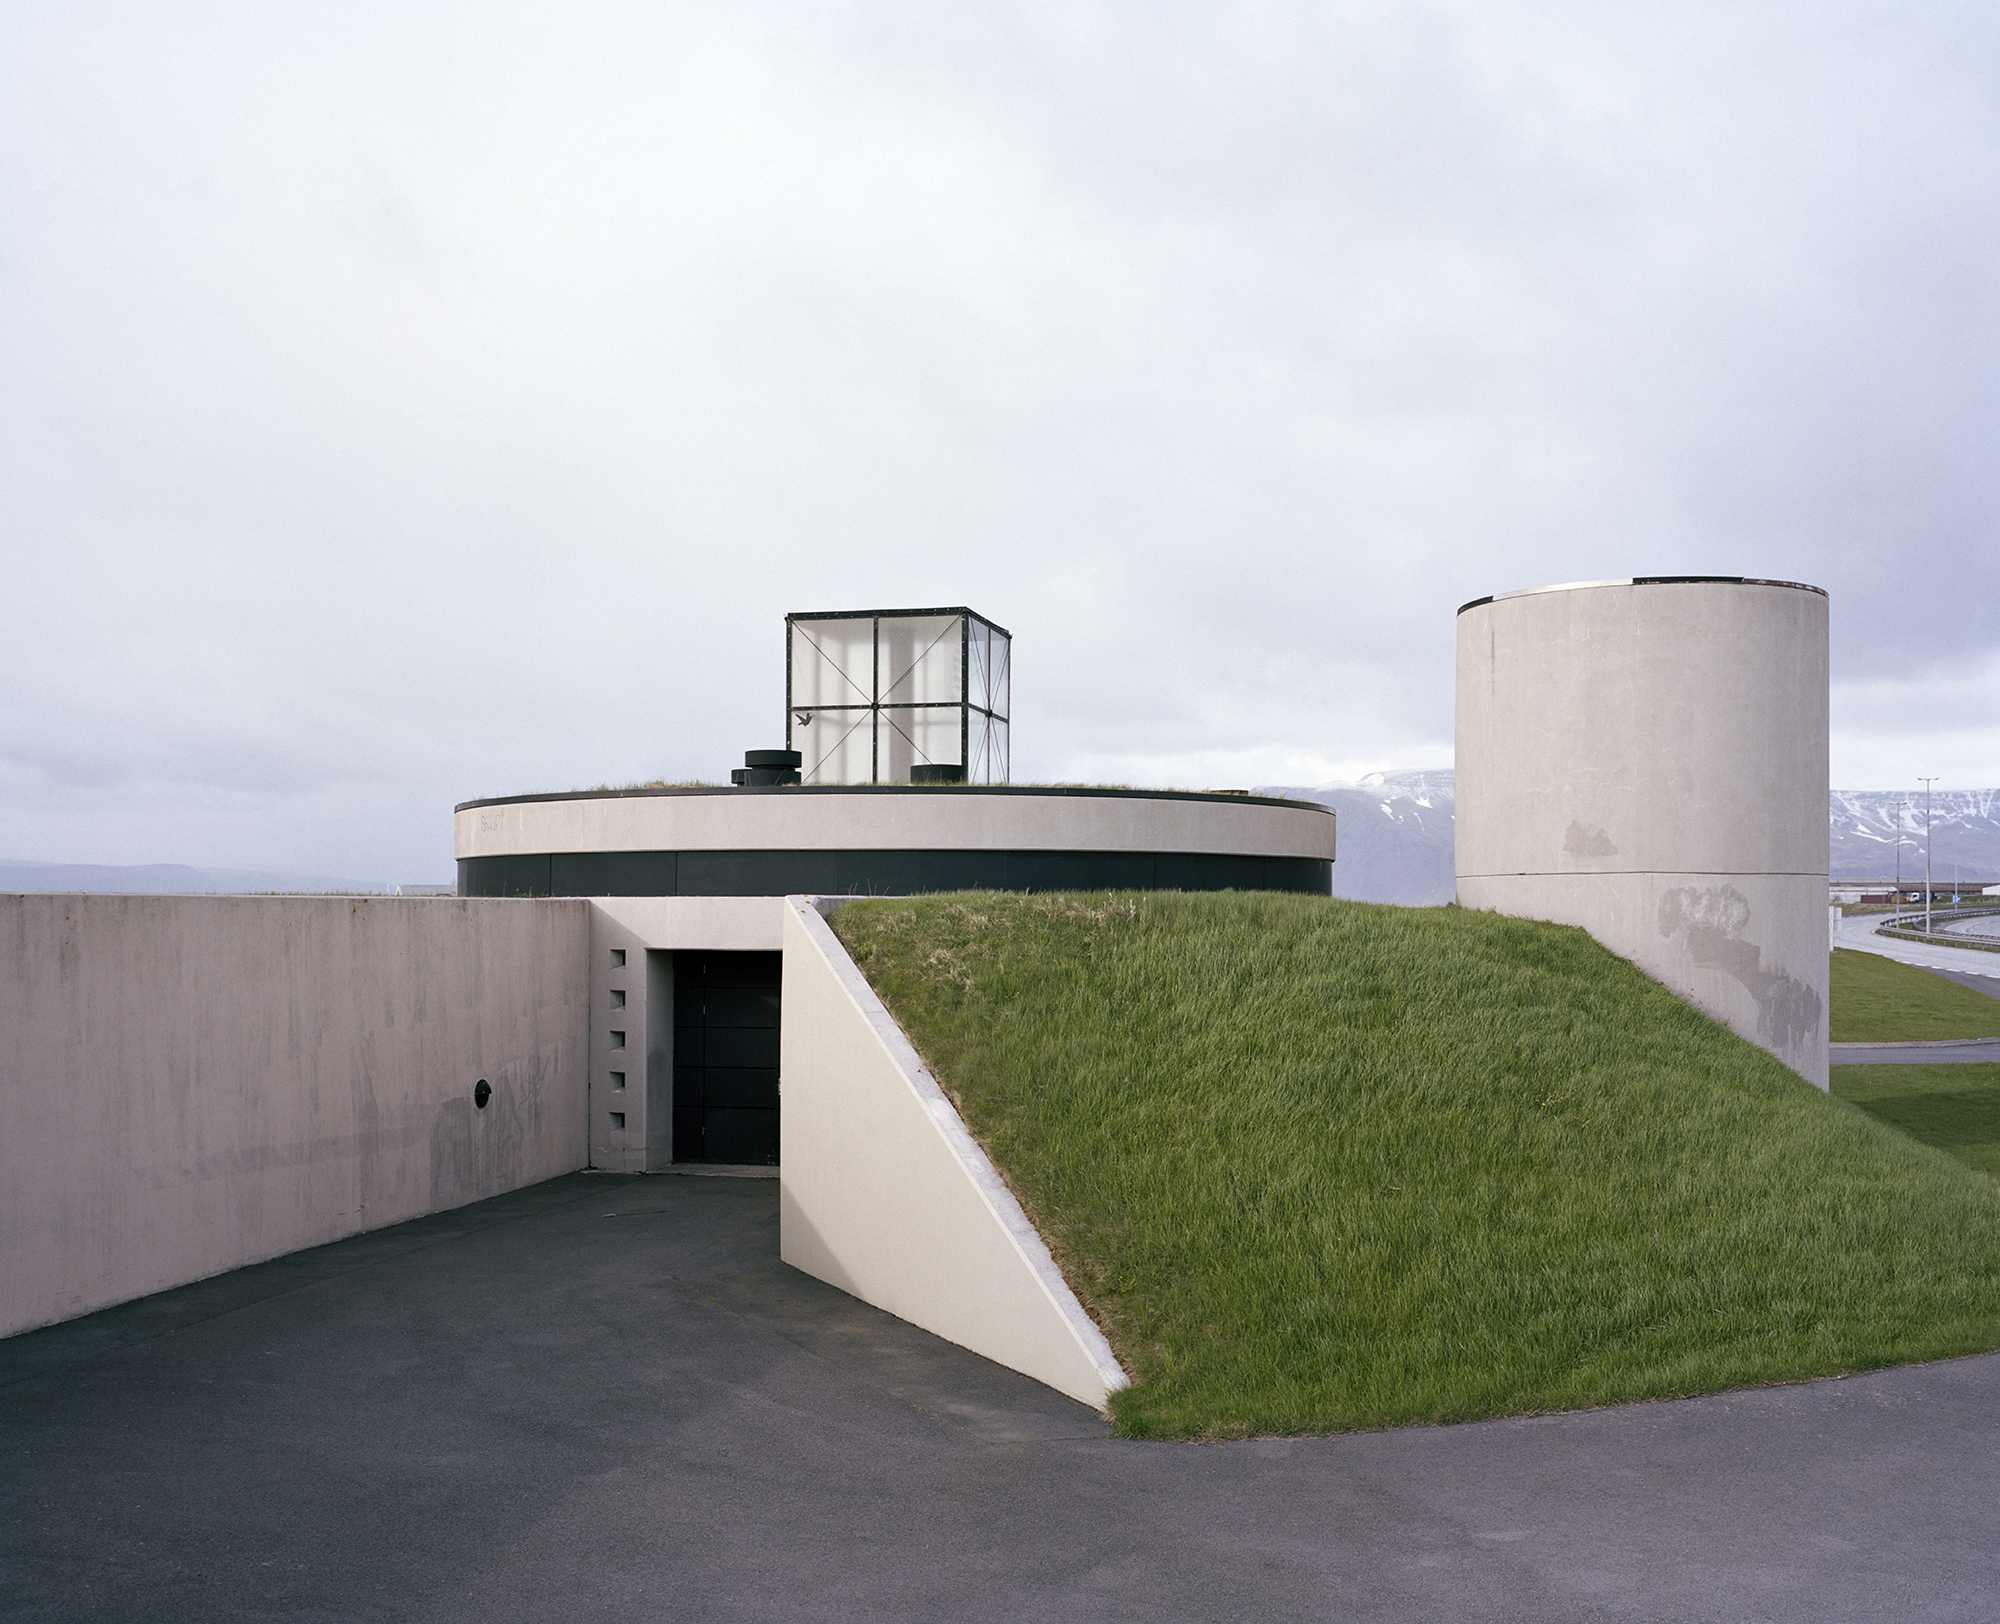 reykjavik copy.jpg